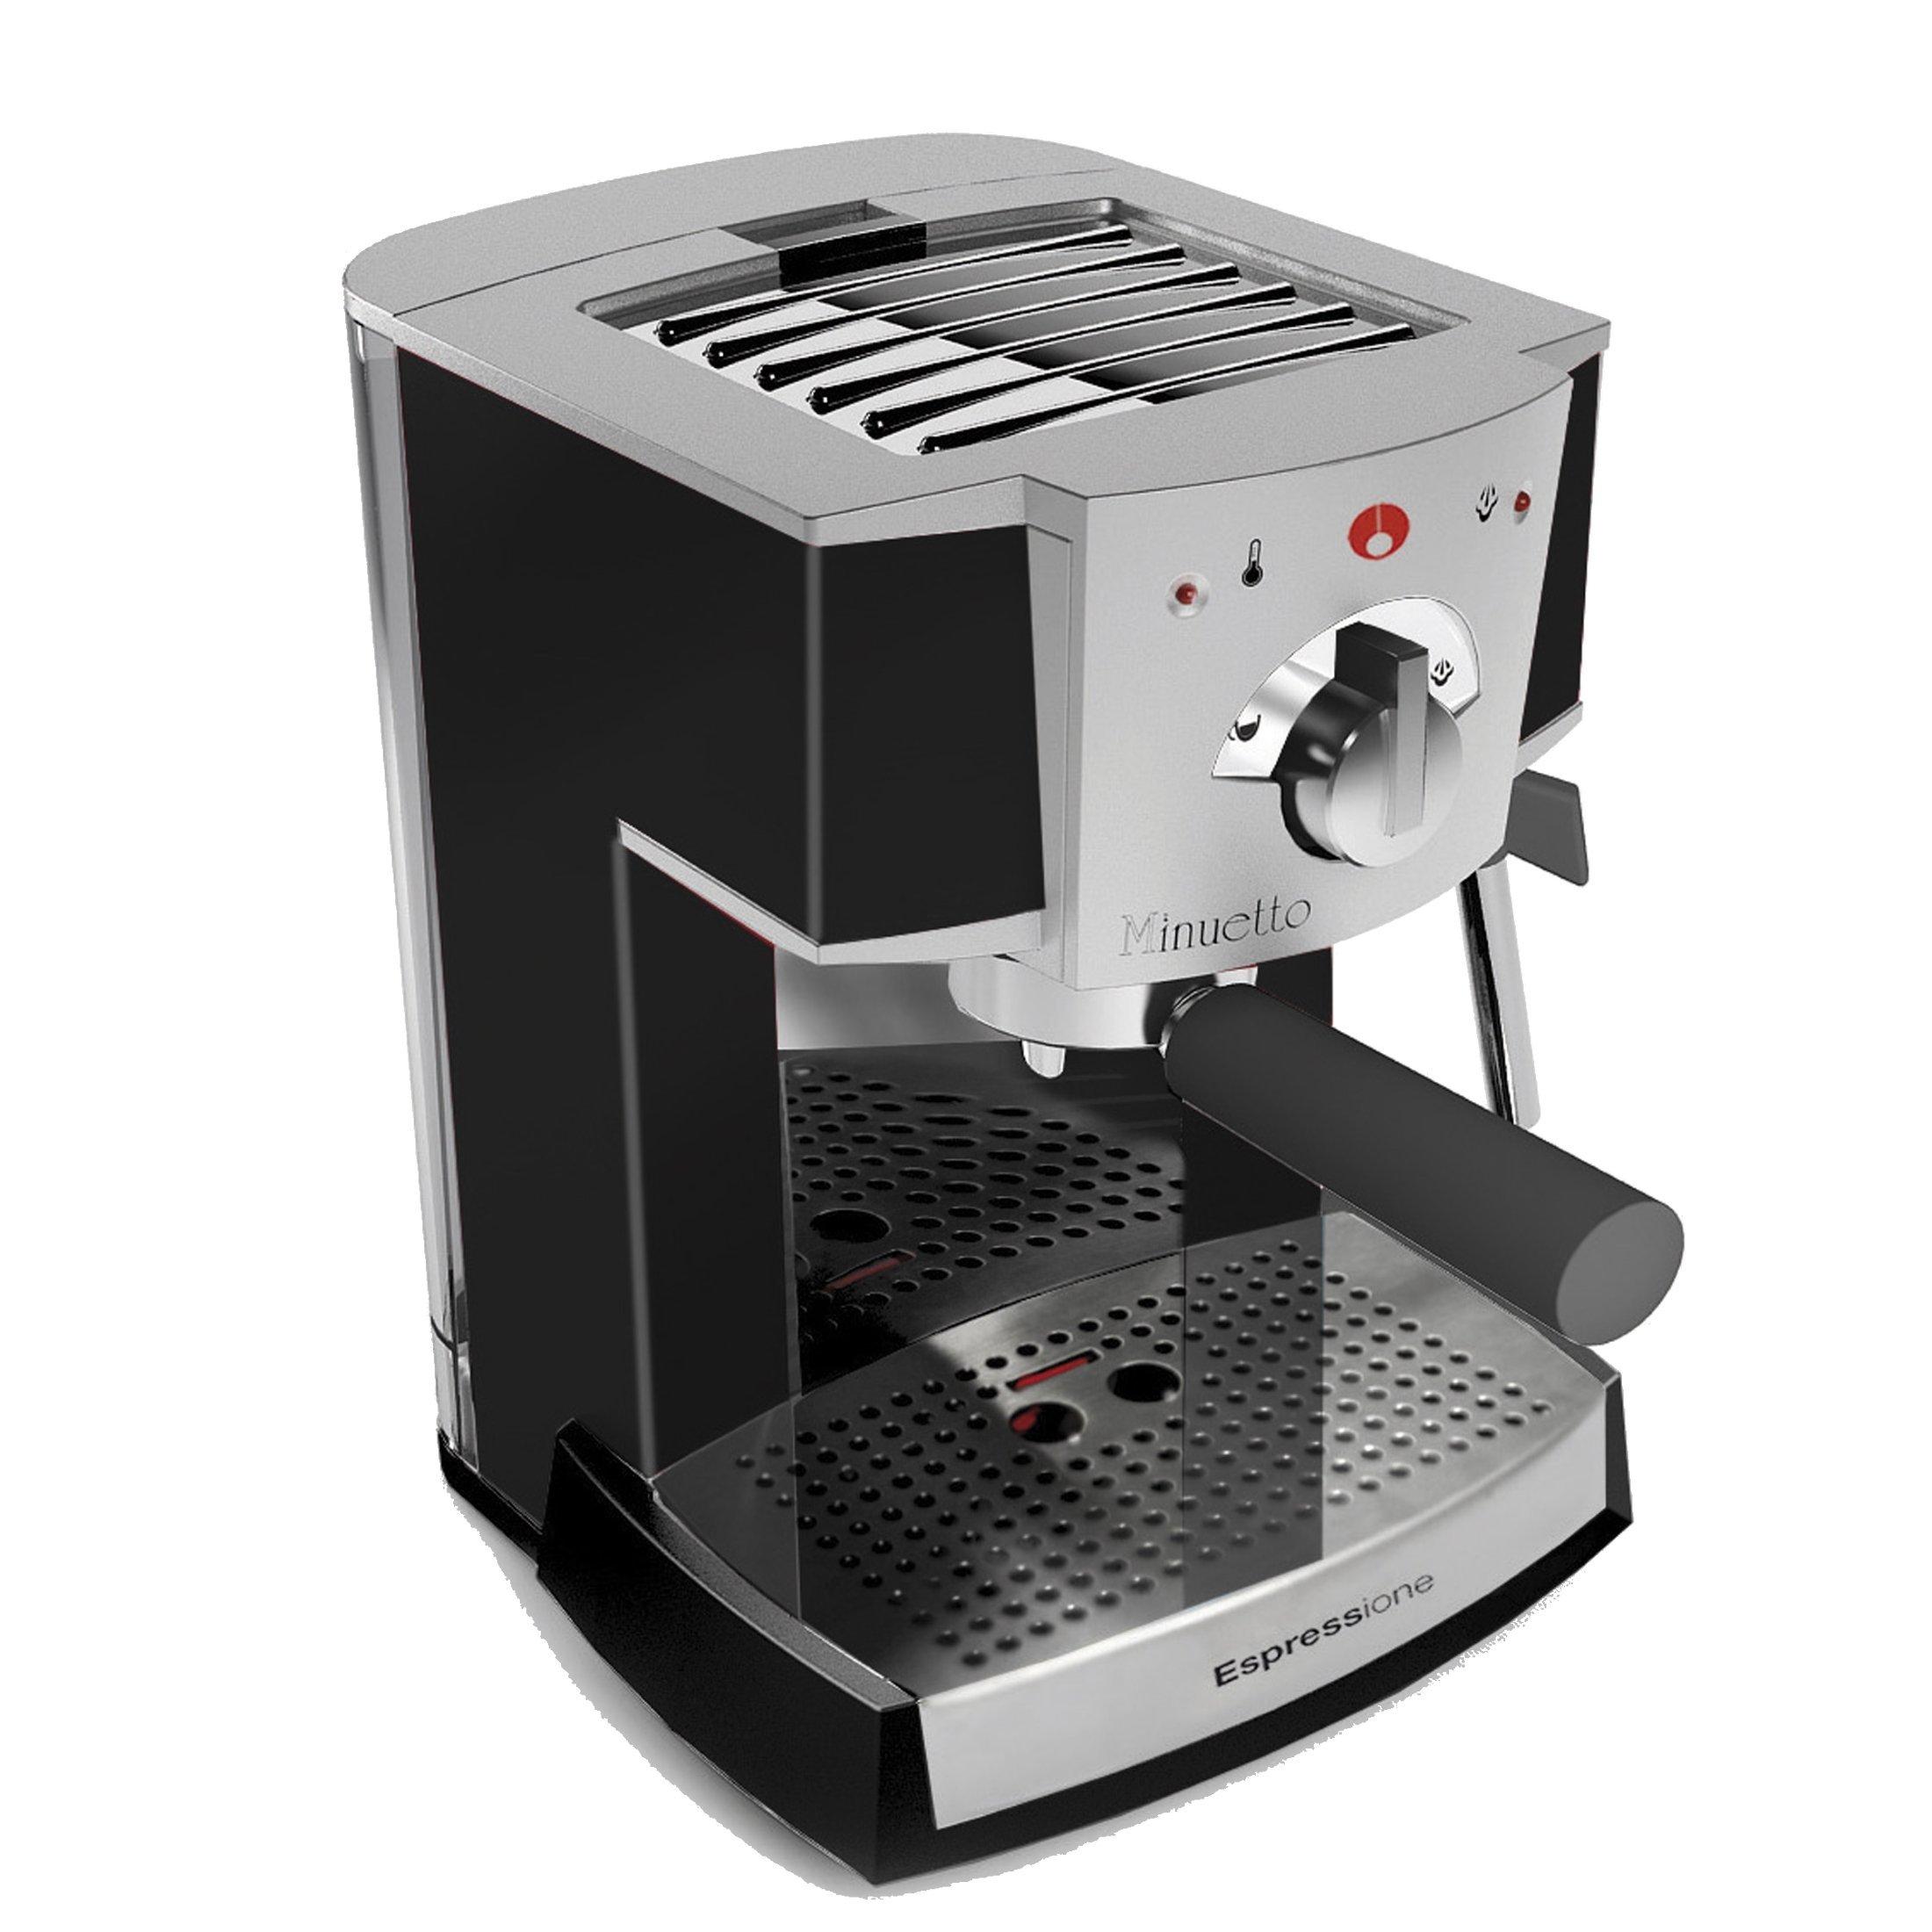 Espressione-Ariete (a company of De'Longhi Group) 1334/1B Cafe Minuetto, Black (Renewed)